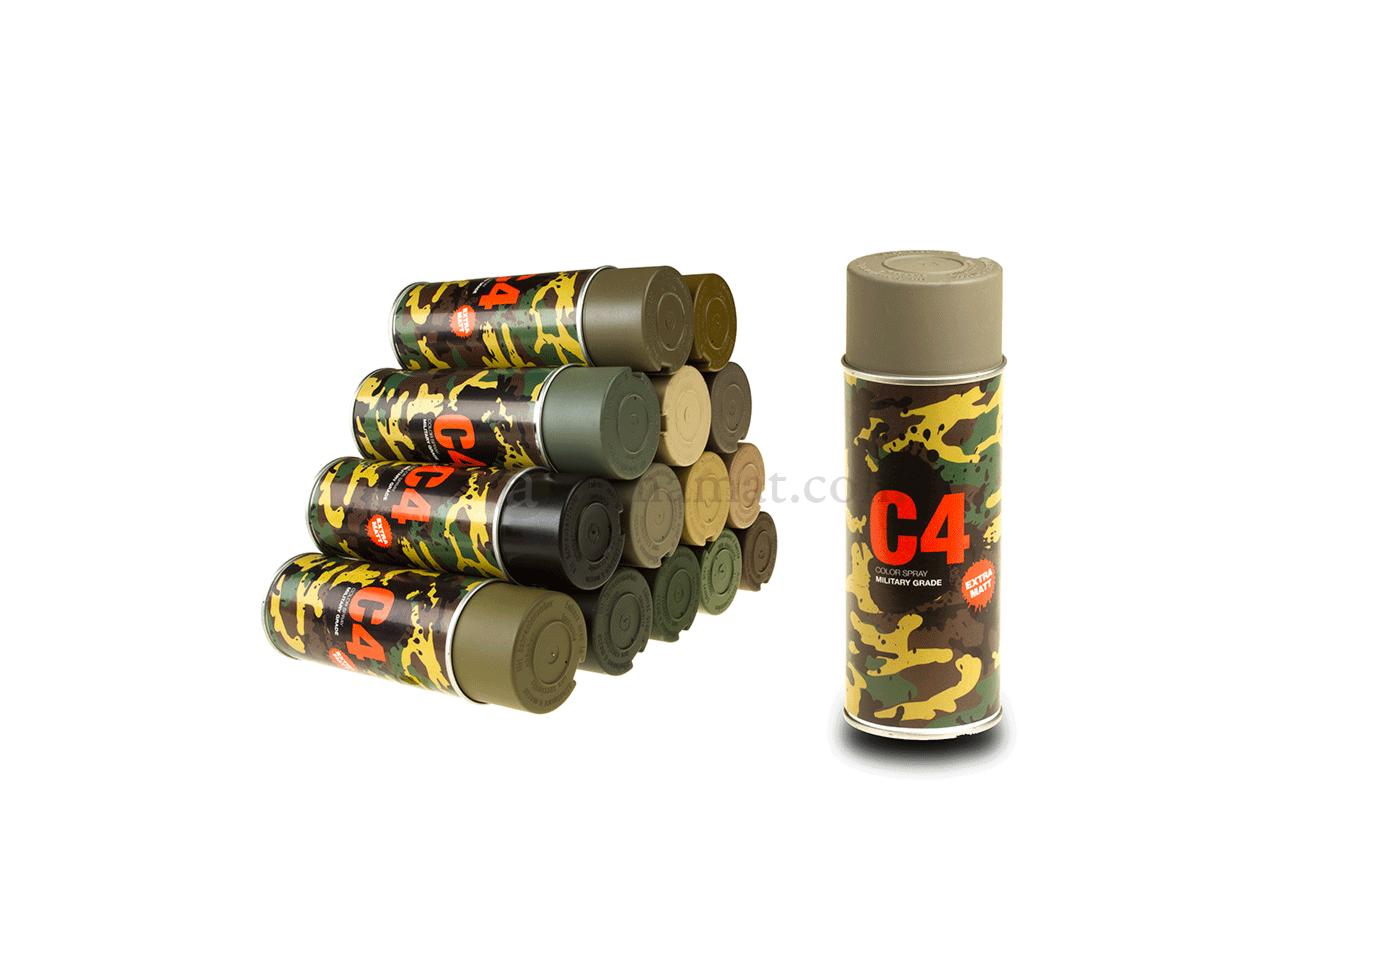 C4 Mil Grade Color Spray Flat Dark Earth Armamat Color Sprays Camouflage Equipment Armamat Online Shop Armamat Com